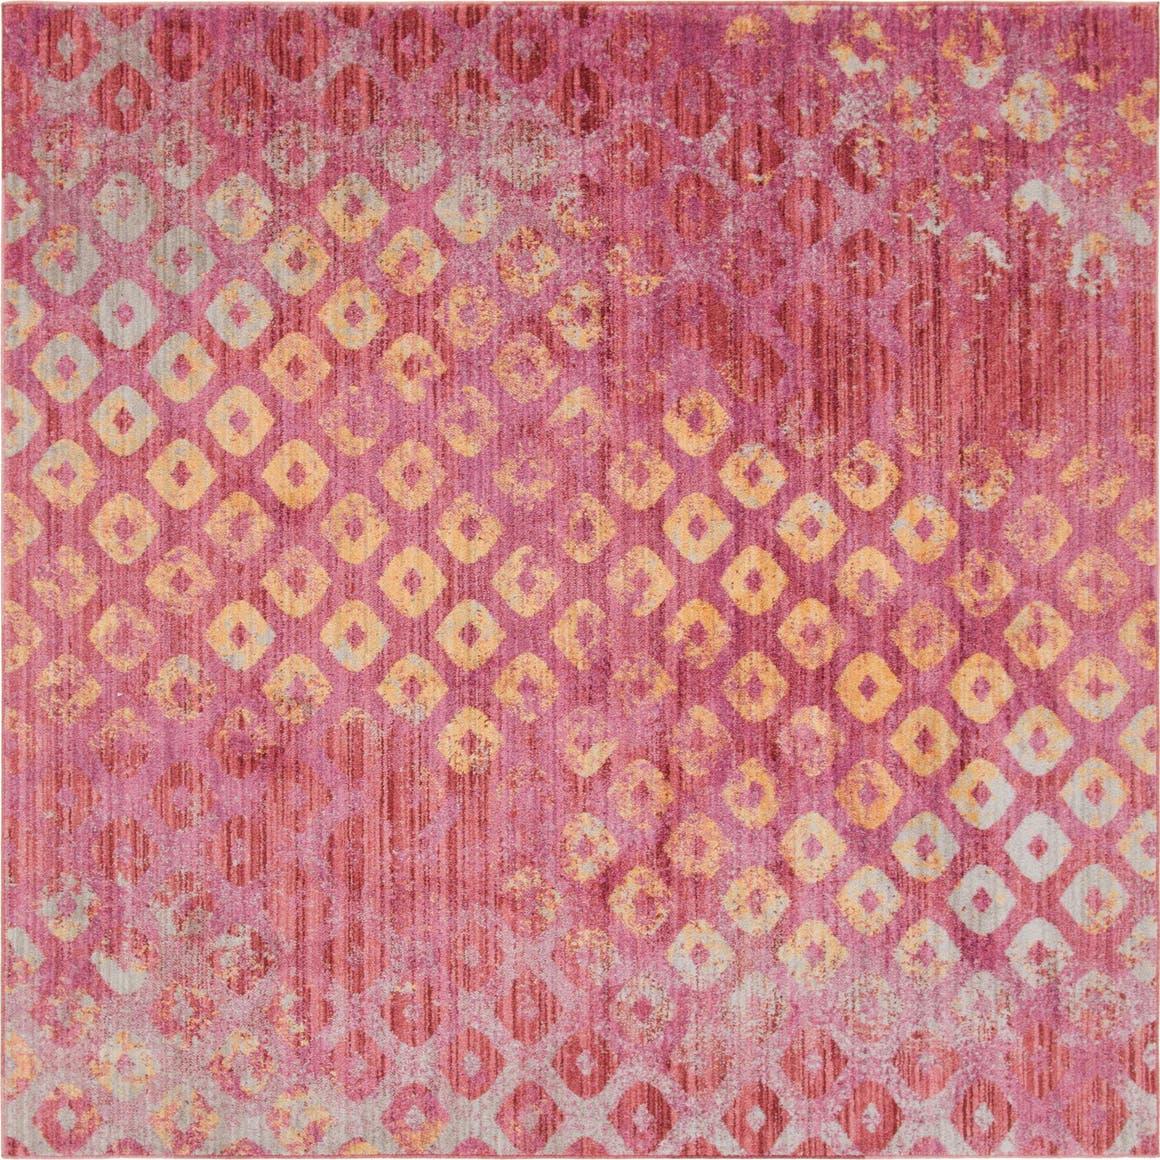 8' x 8' Prism Square Rug main image